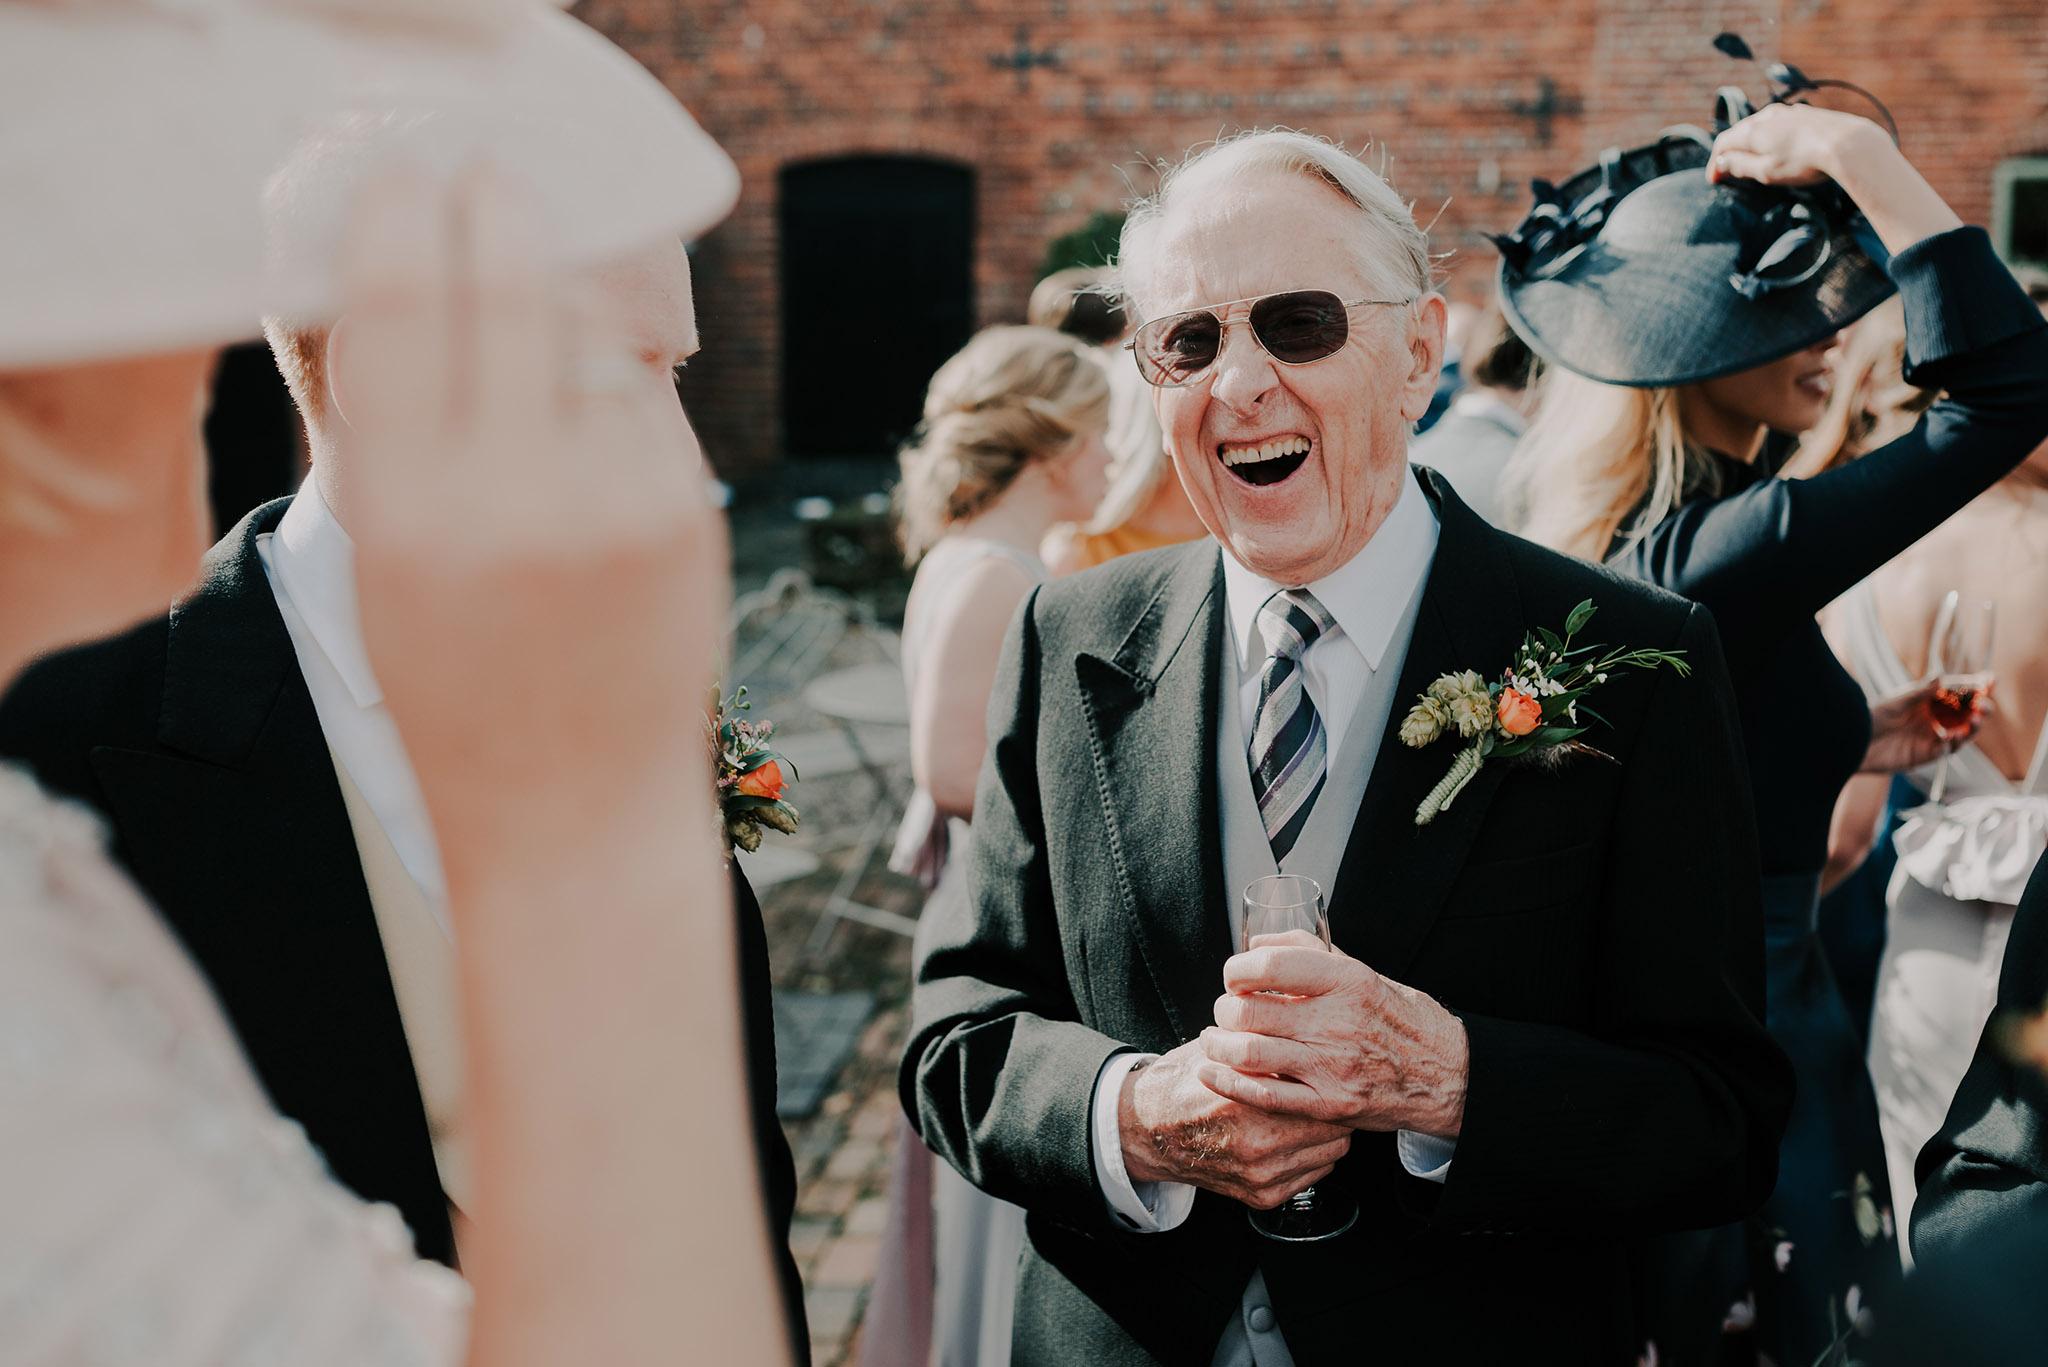 scott-stockwell-photography-wedding-55.jpg